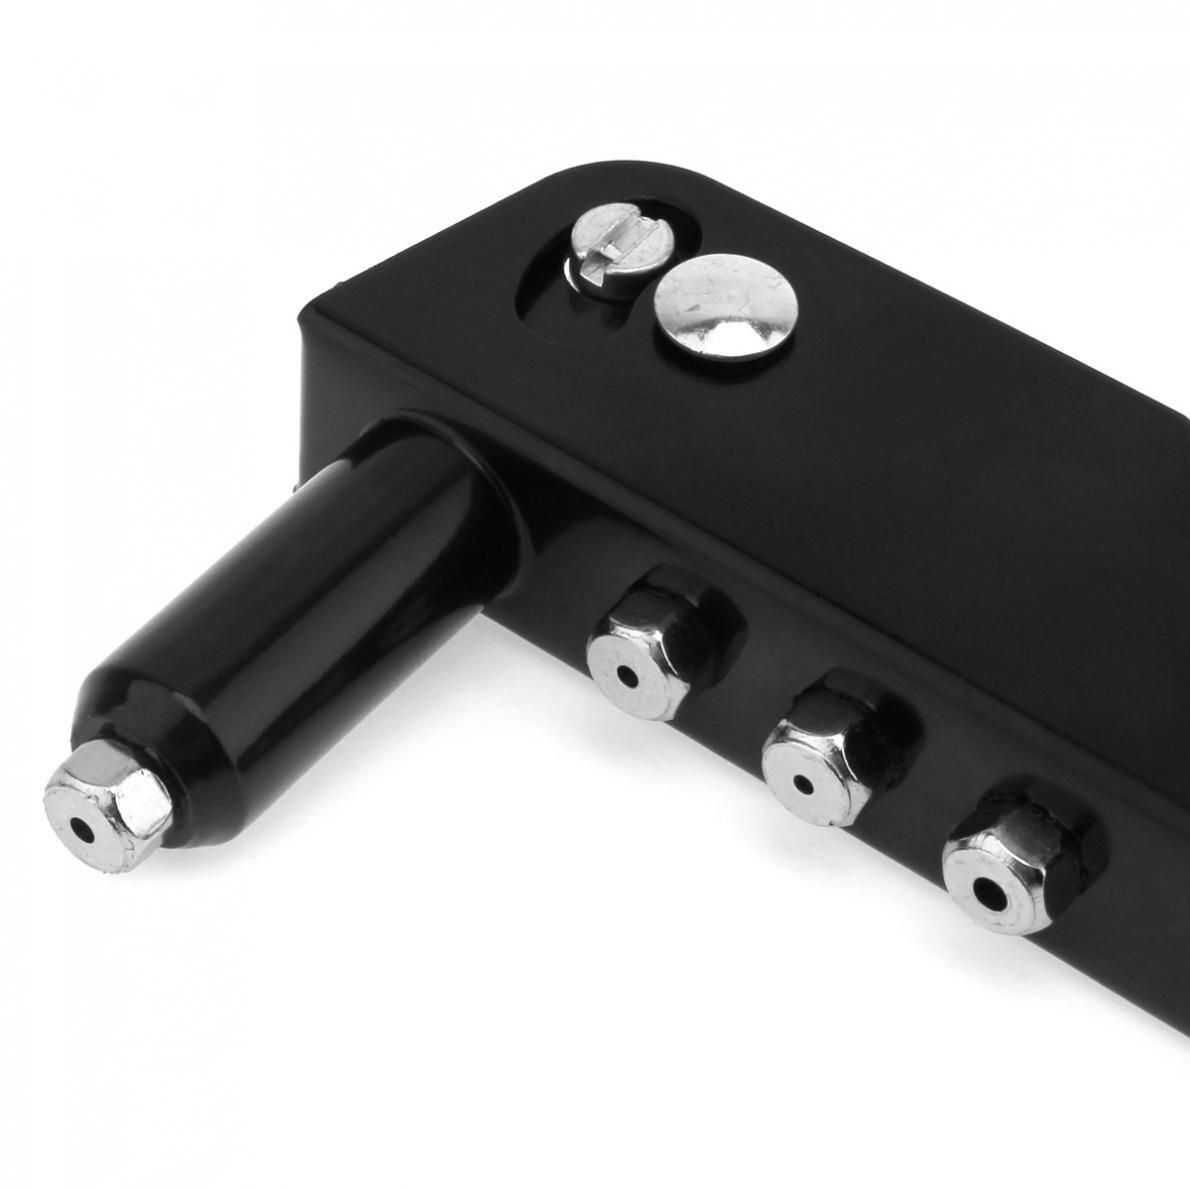 Image 2 - Hand Riveter Manual Light weight Rivet Gun Kit Blind Rivet Hand Tool Gutter Gutter Repair Heavy Duty Professional Tool-in Nail Guns from Tools on